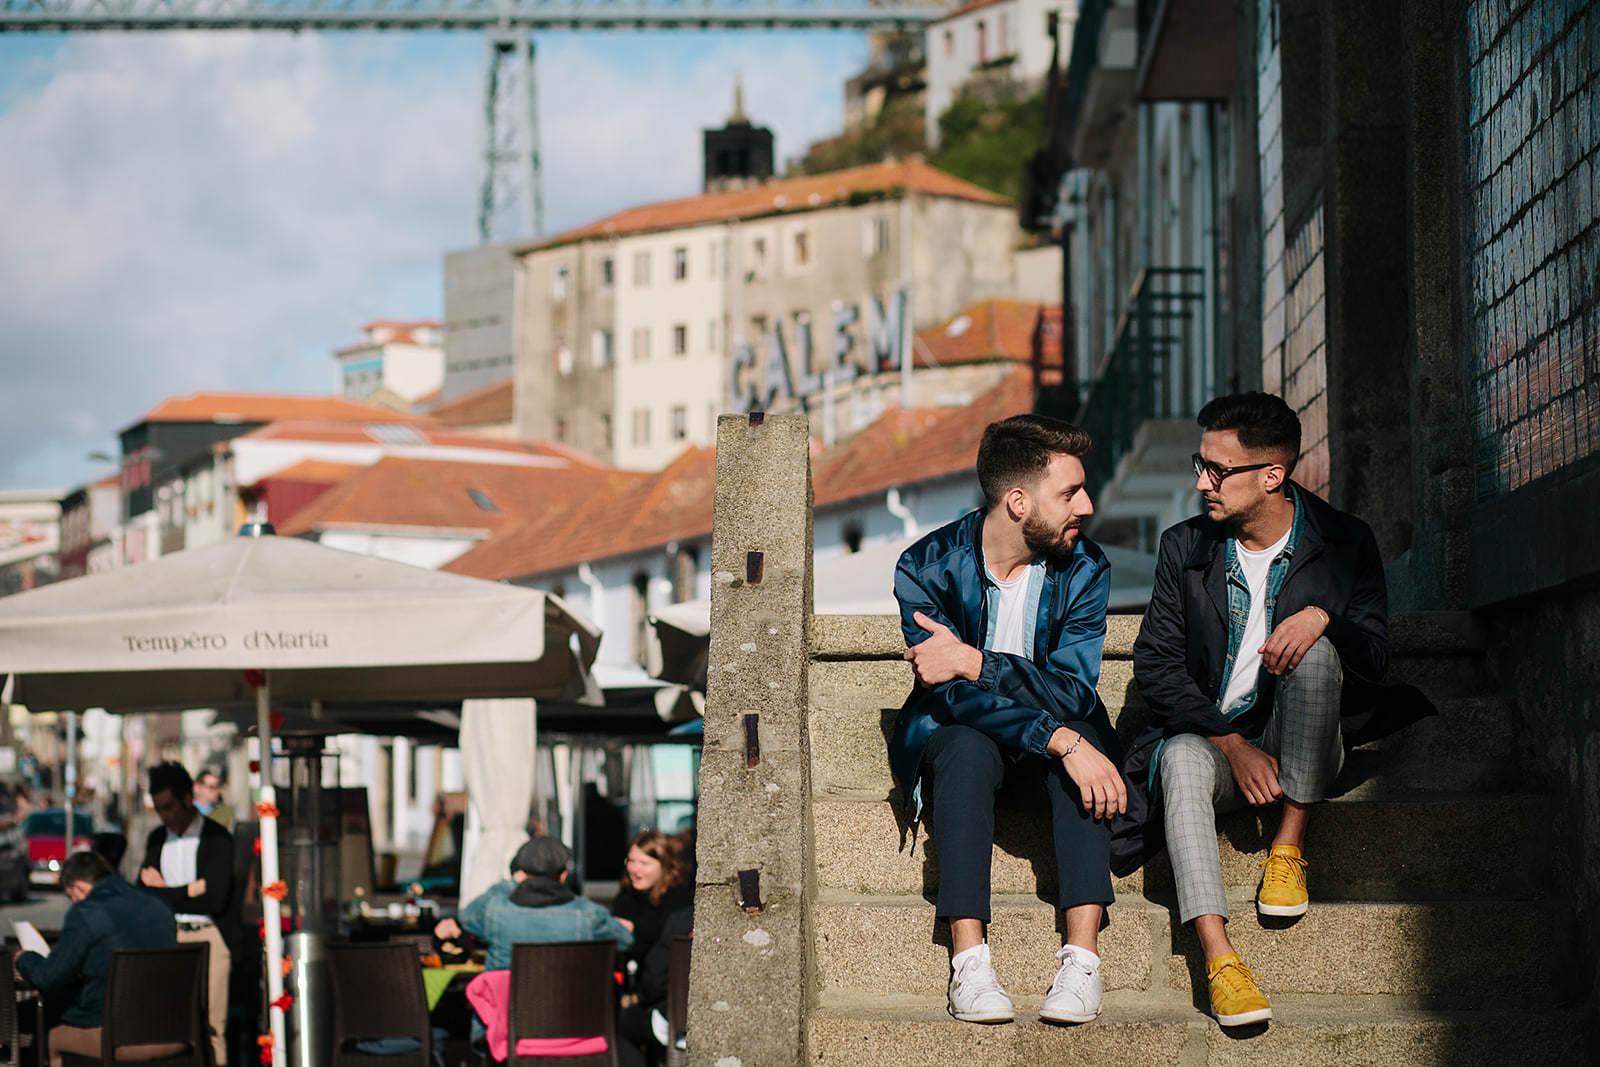 Sessao-Pedro-Pepe-Porto-Oceanica-5.jpg